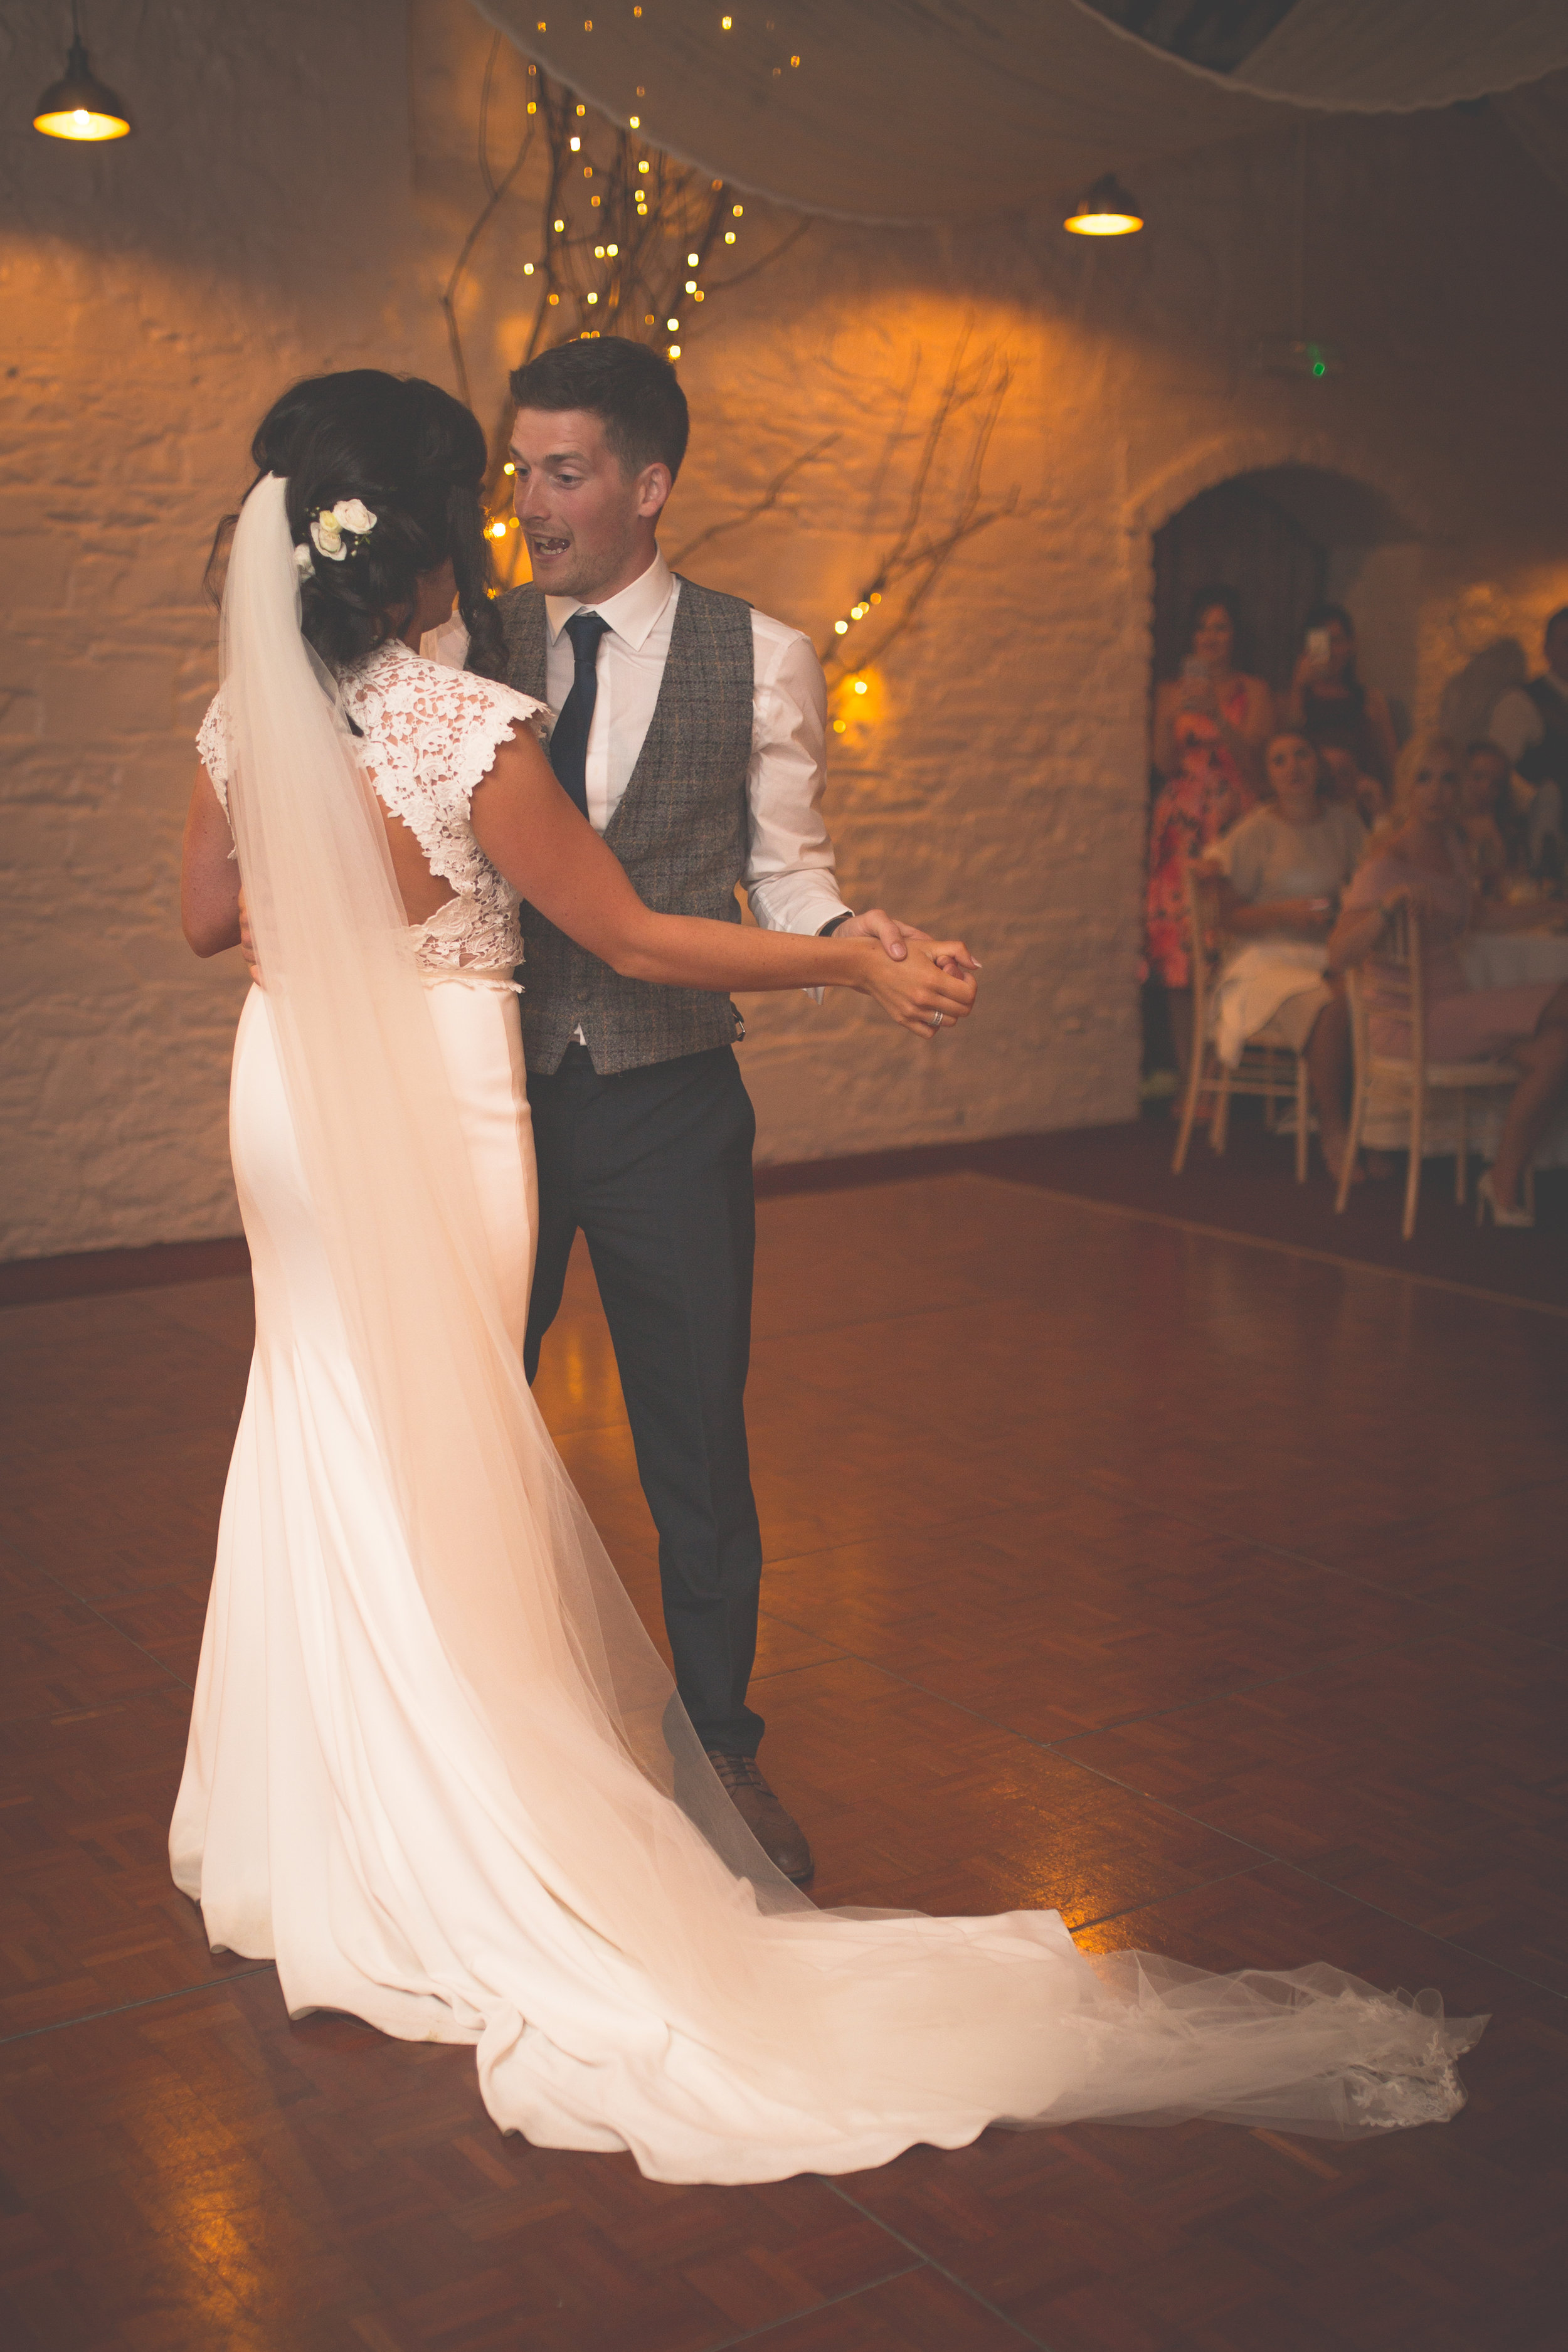 Brian McEwan Wedding Photography | Carol-Annee & Sean | The Dancing-28.jpg